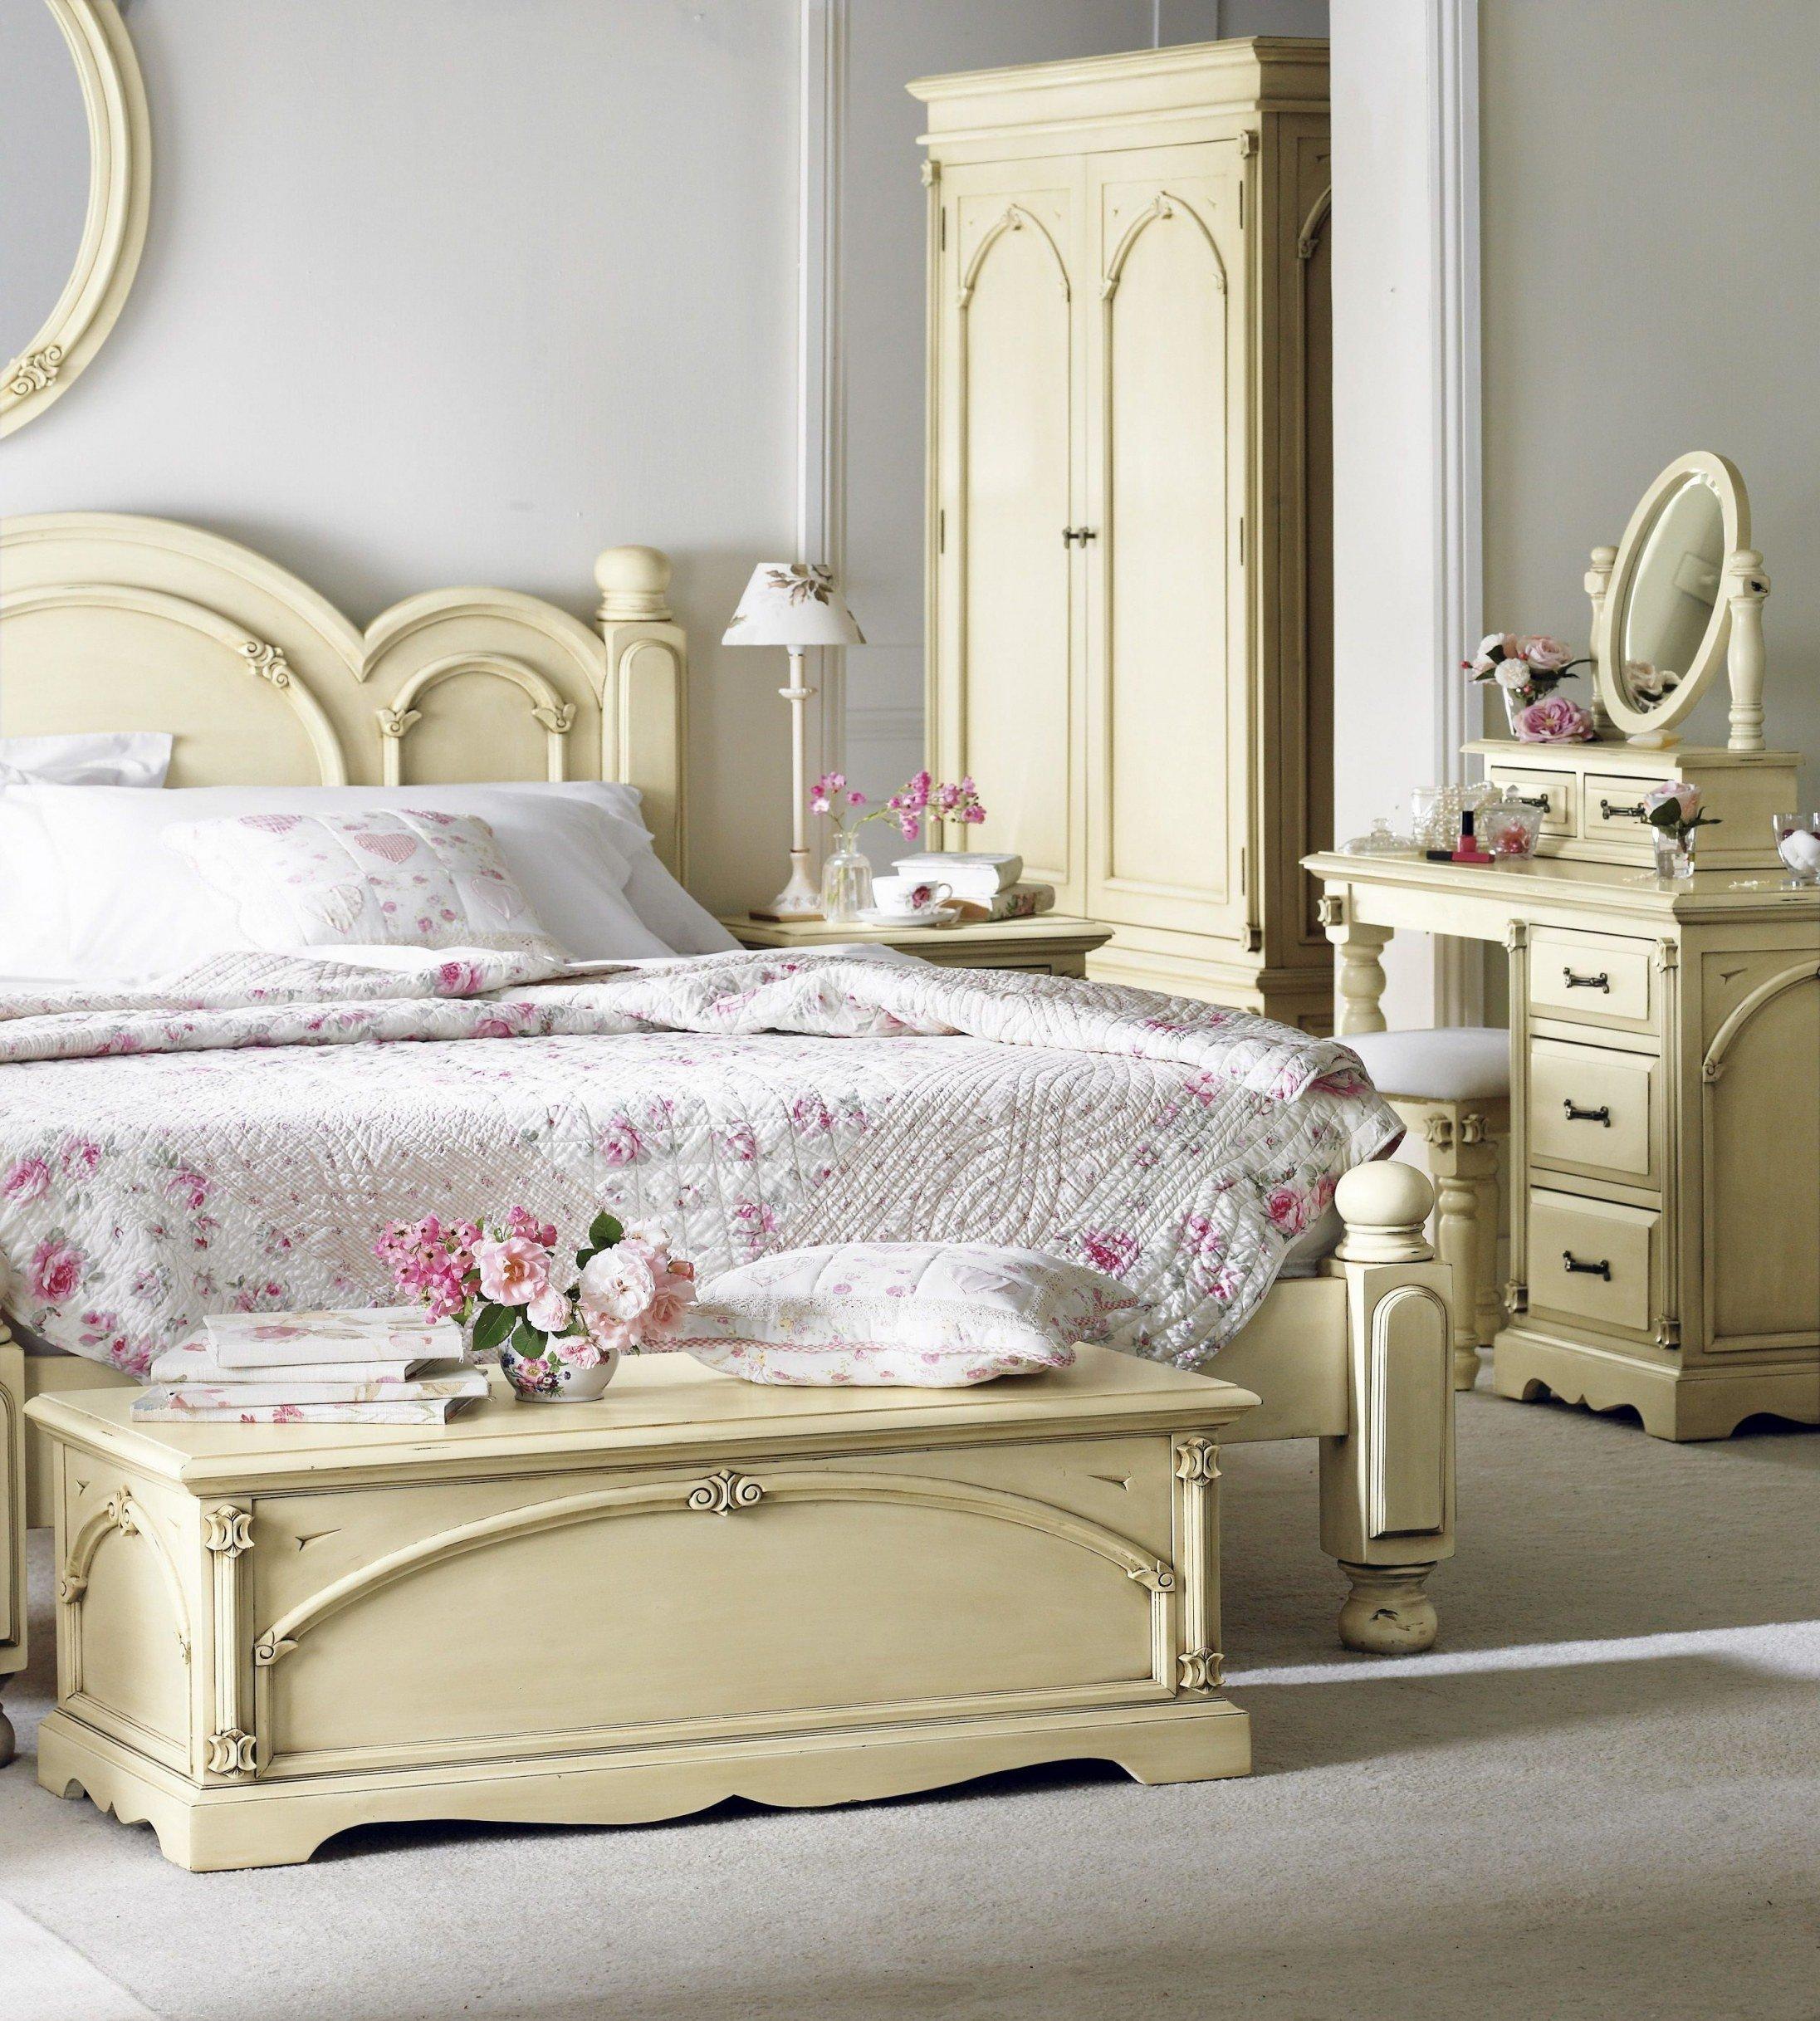 Dresser for Small Bedroom Inspirational Teen Girls Bedroom Ideas Bedroom Cool Gray Bedroom Decor